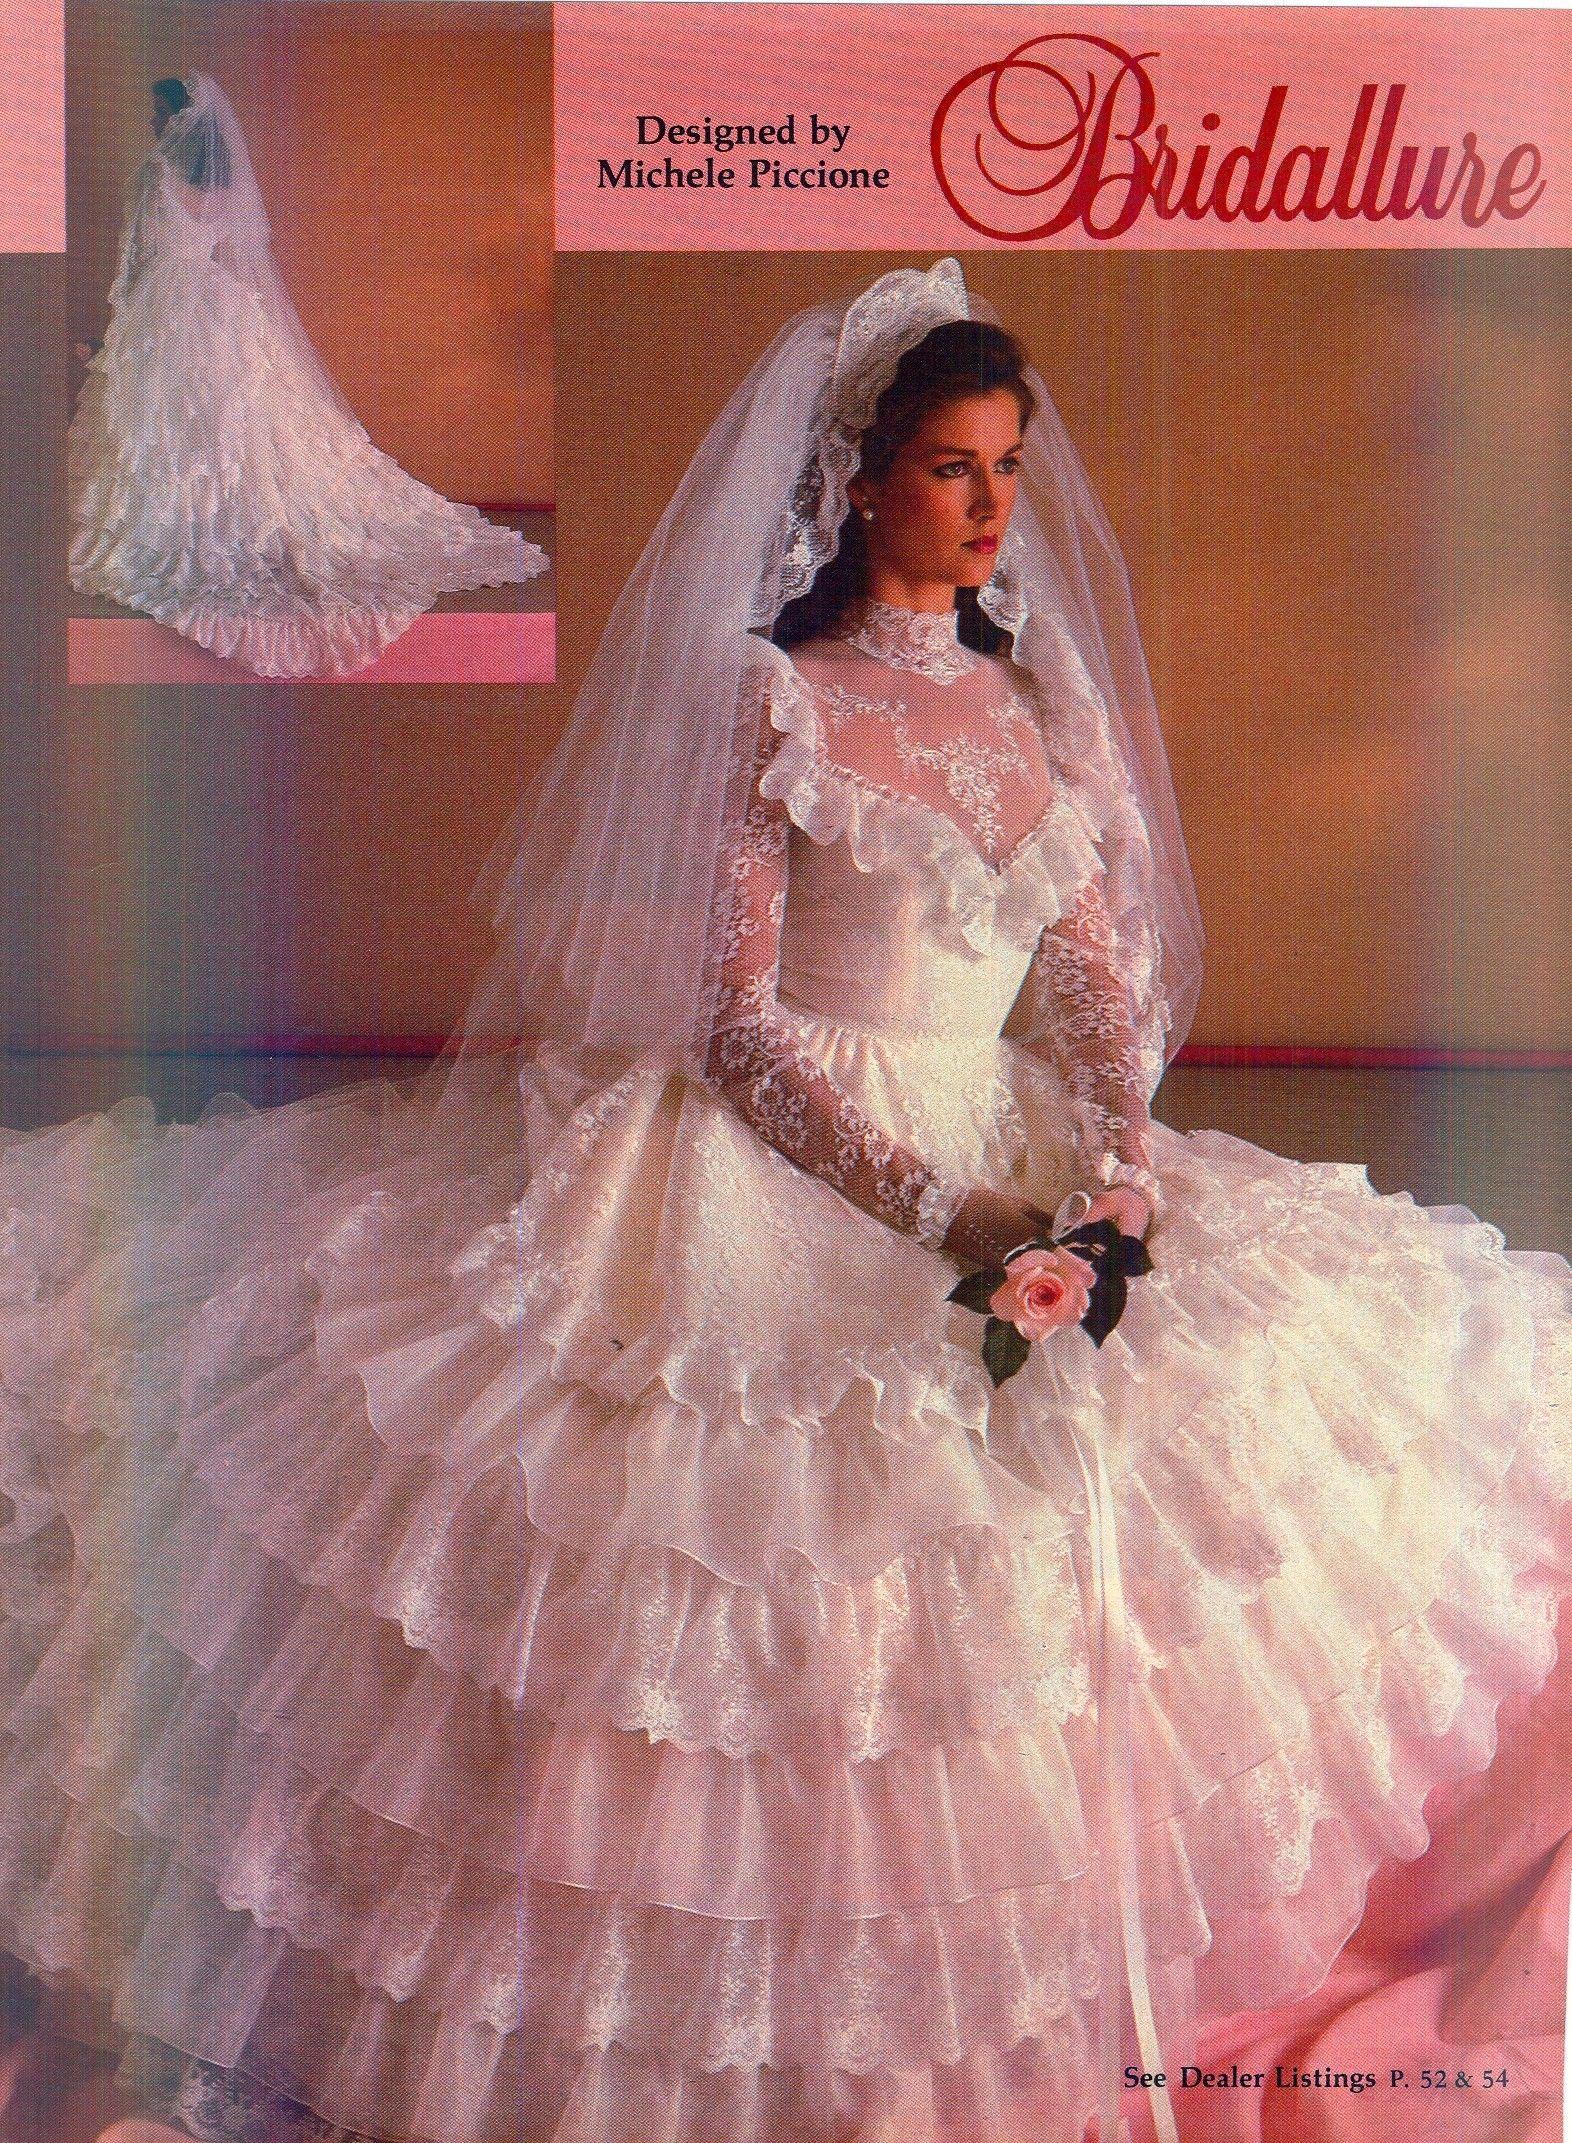 Brides Magazine December 1983/January 1984